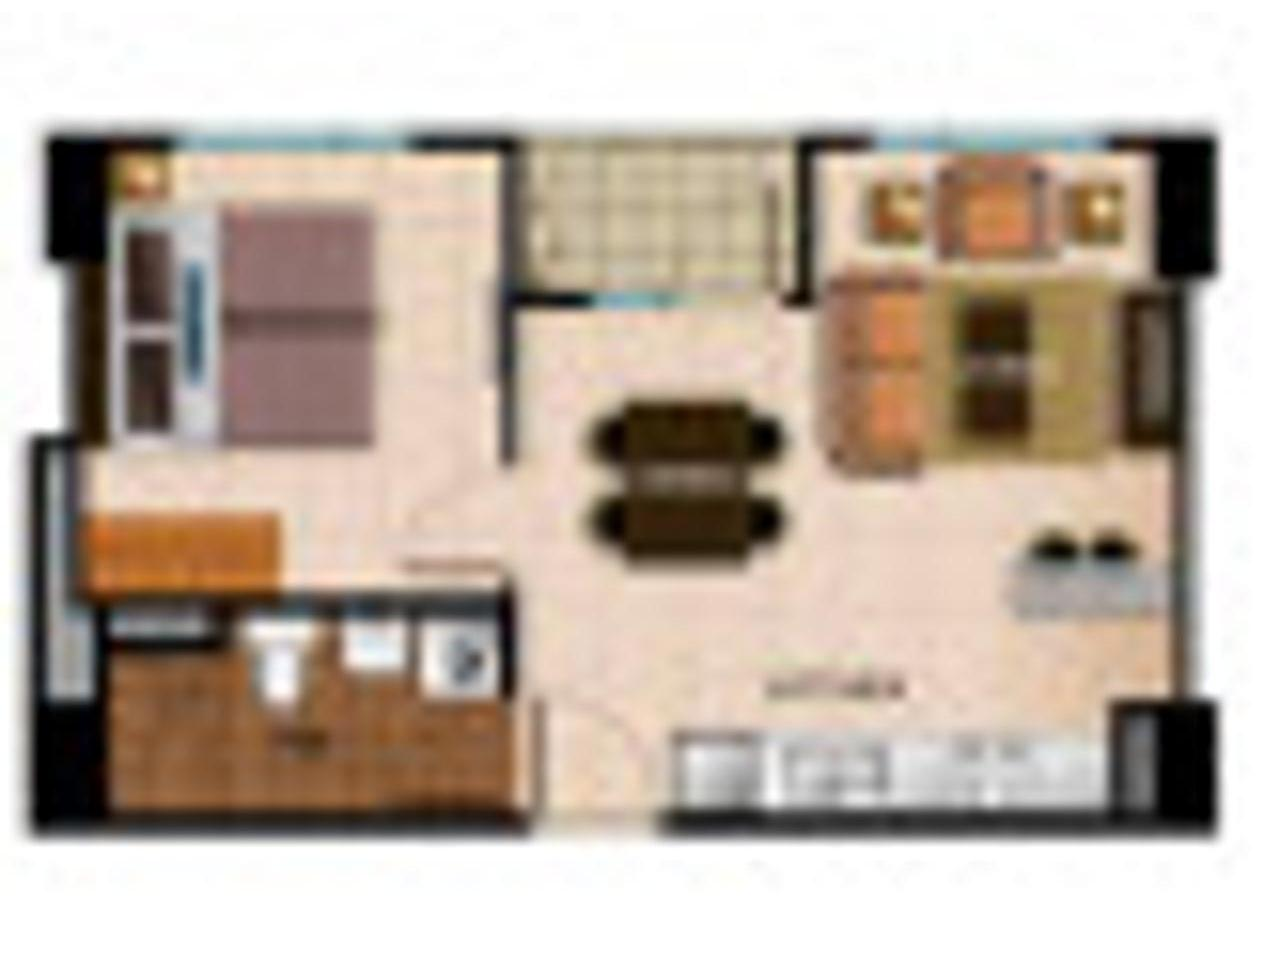 Condominium For sale in Barangay San Rafael, Mandurriao District, Iloilo City, Iloilo City, Western Visayas (region 6)